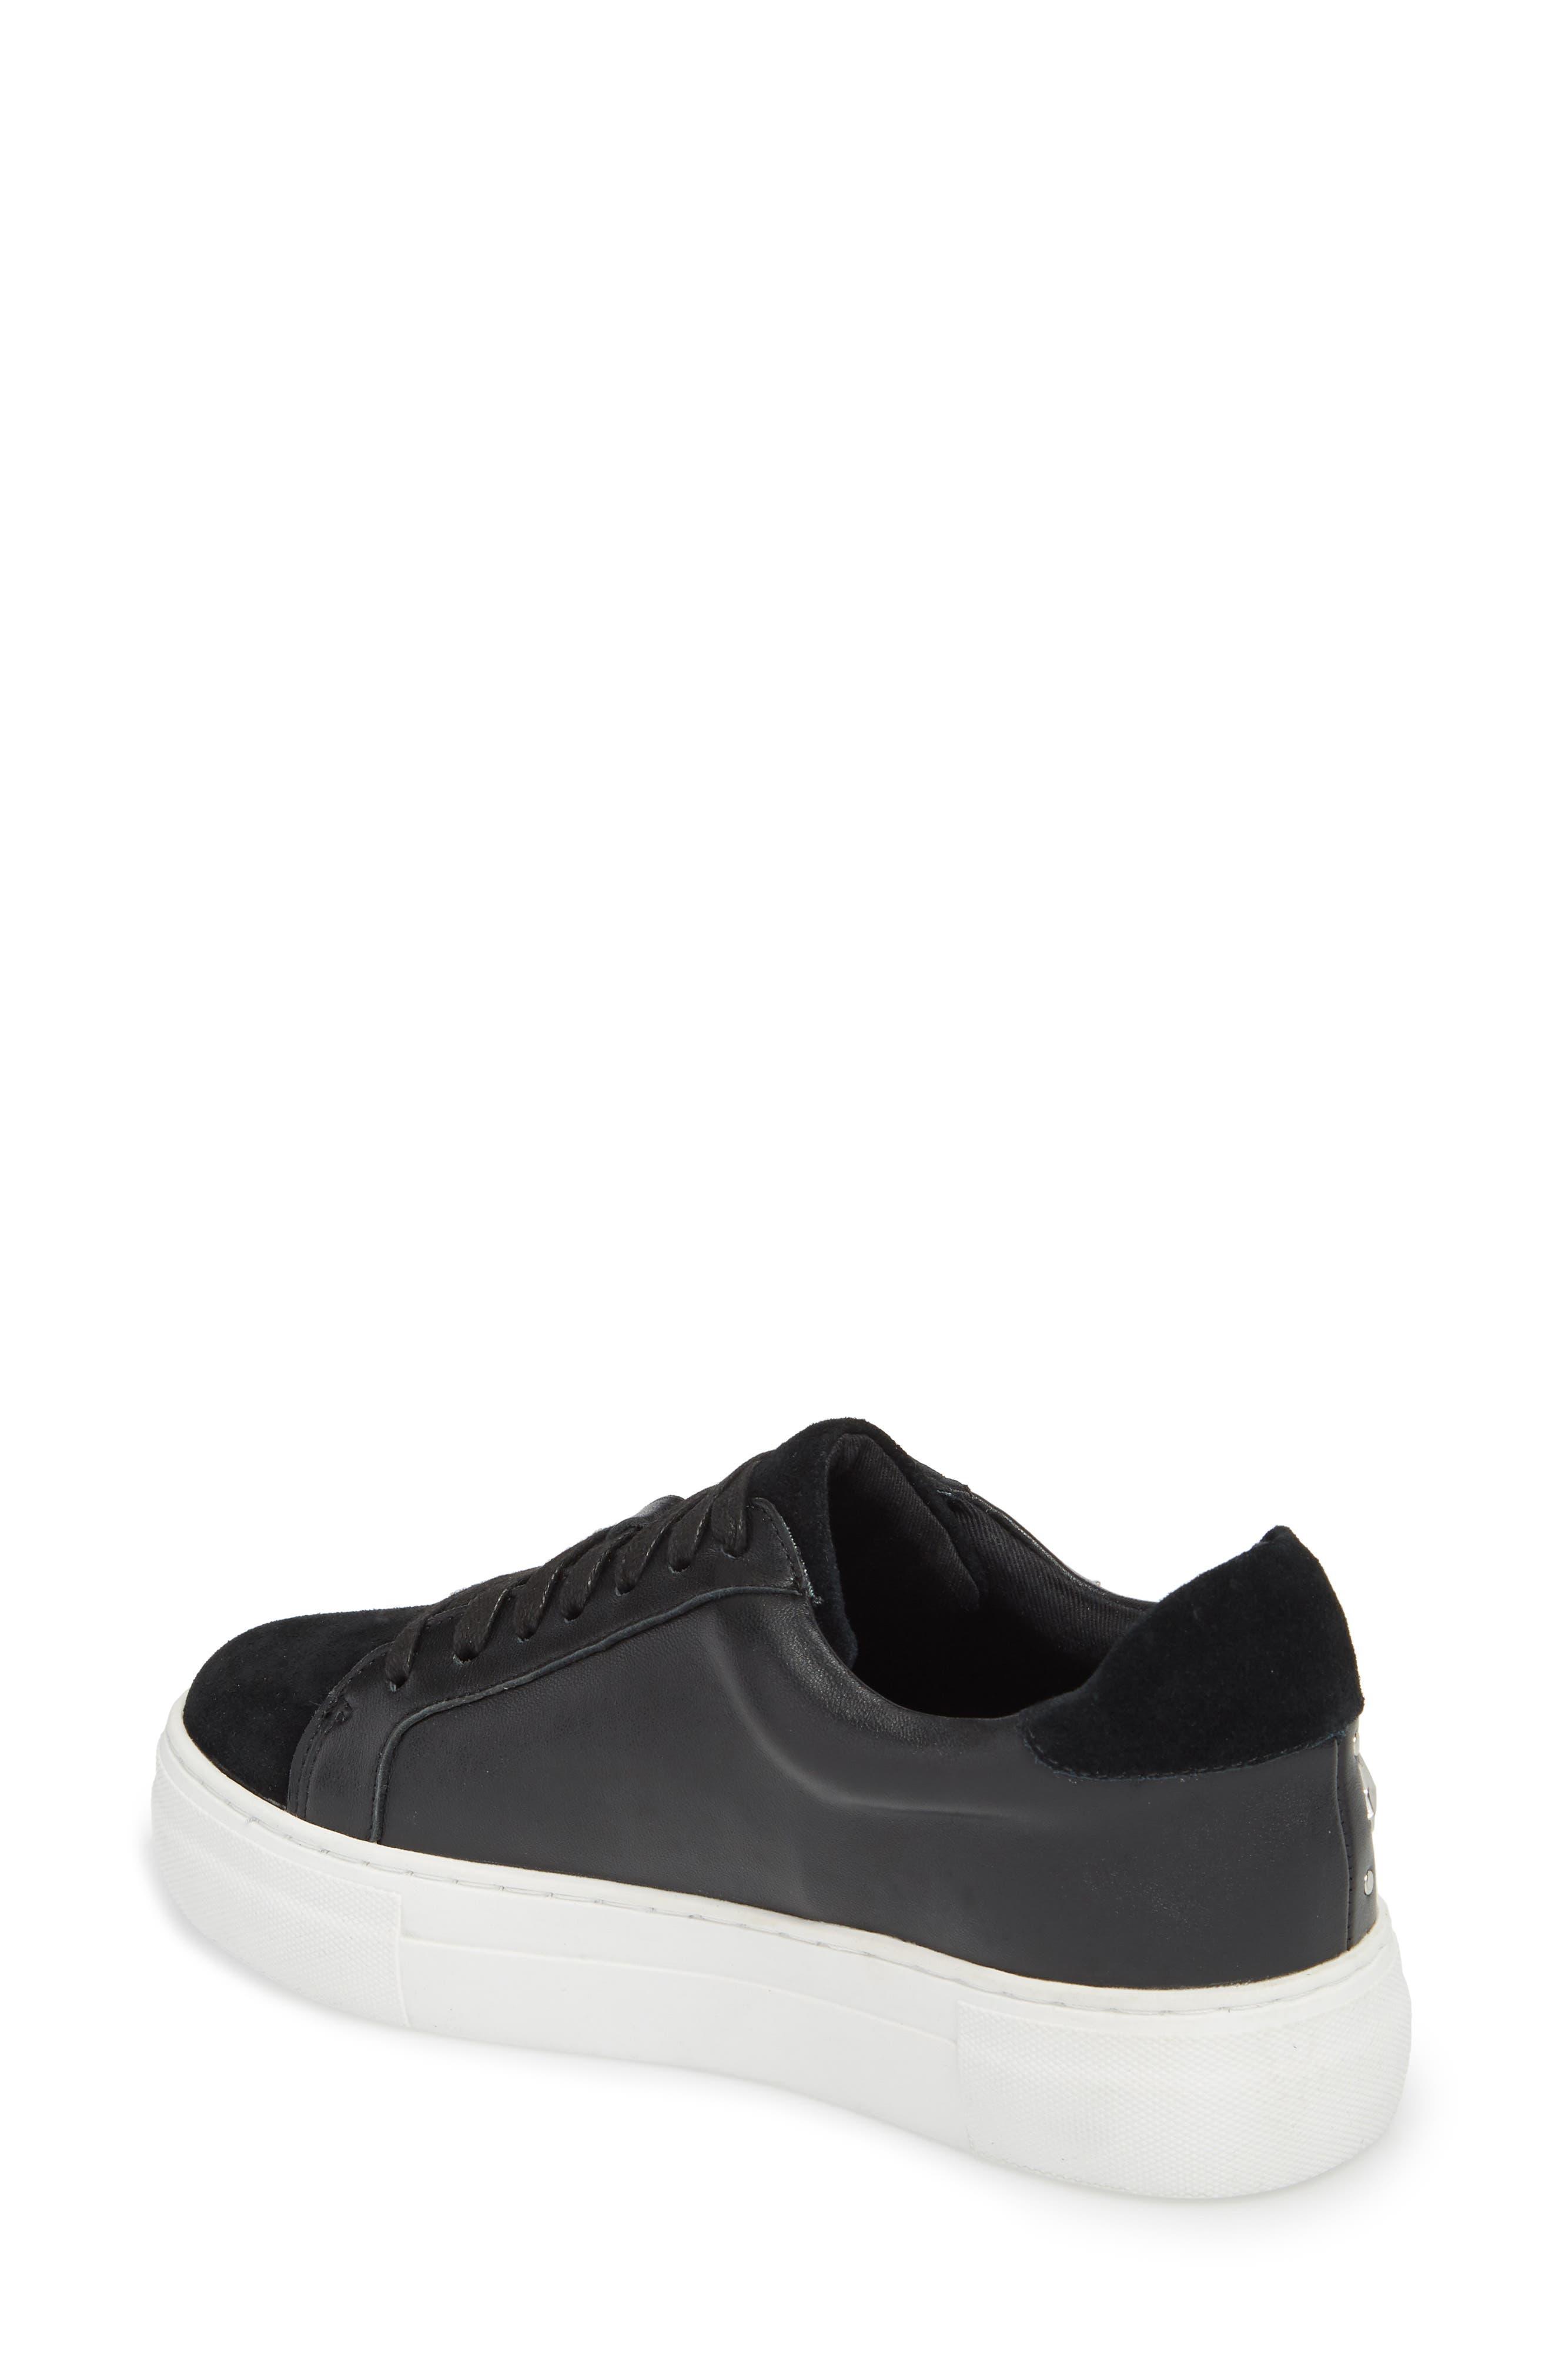 Active Star Platform Sneaker,                             Alternate thumbnail 2, color,                             001